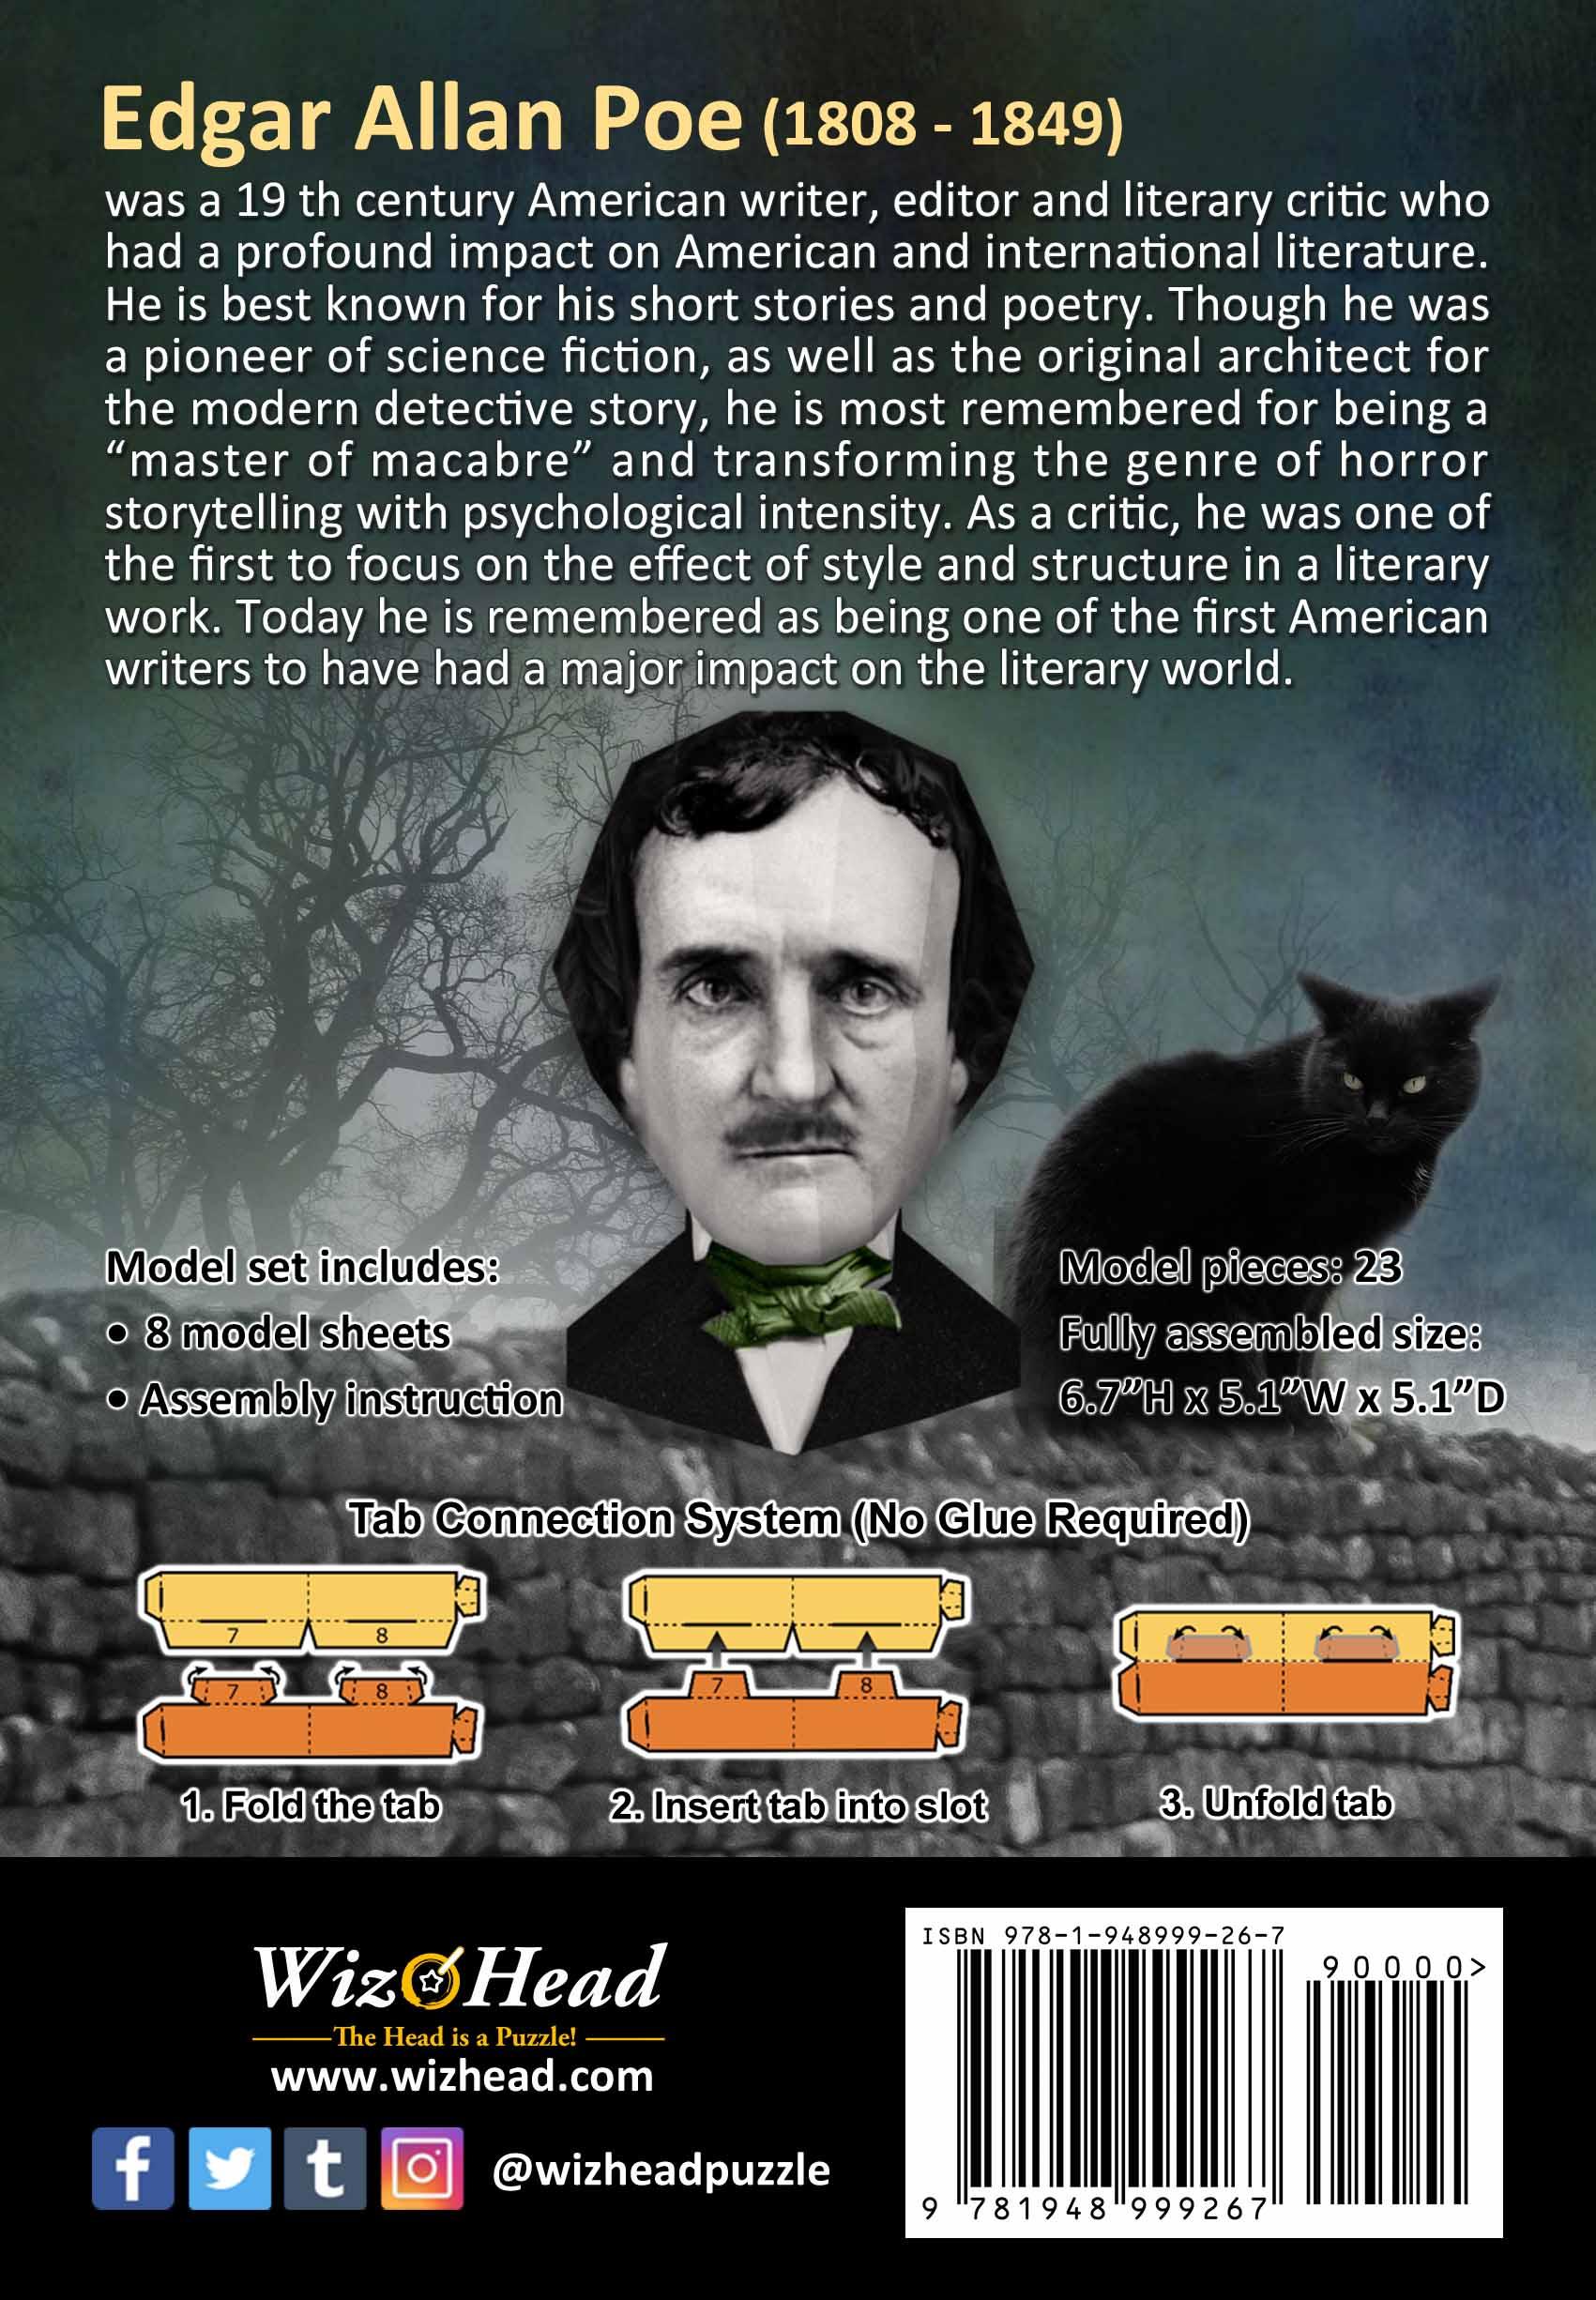 Edgar Allan Poe (Full Size)